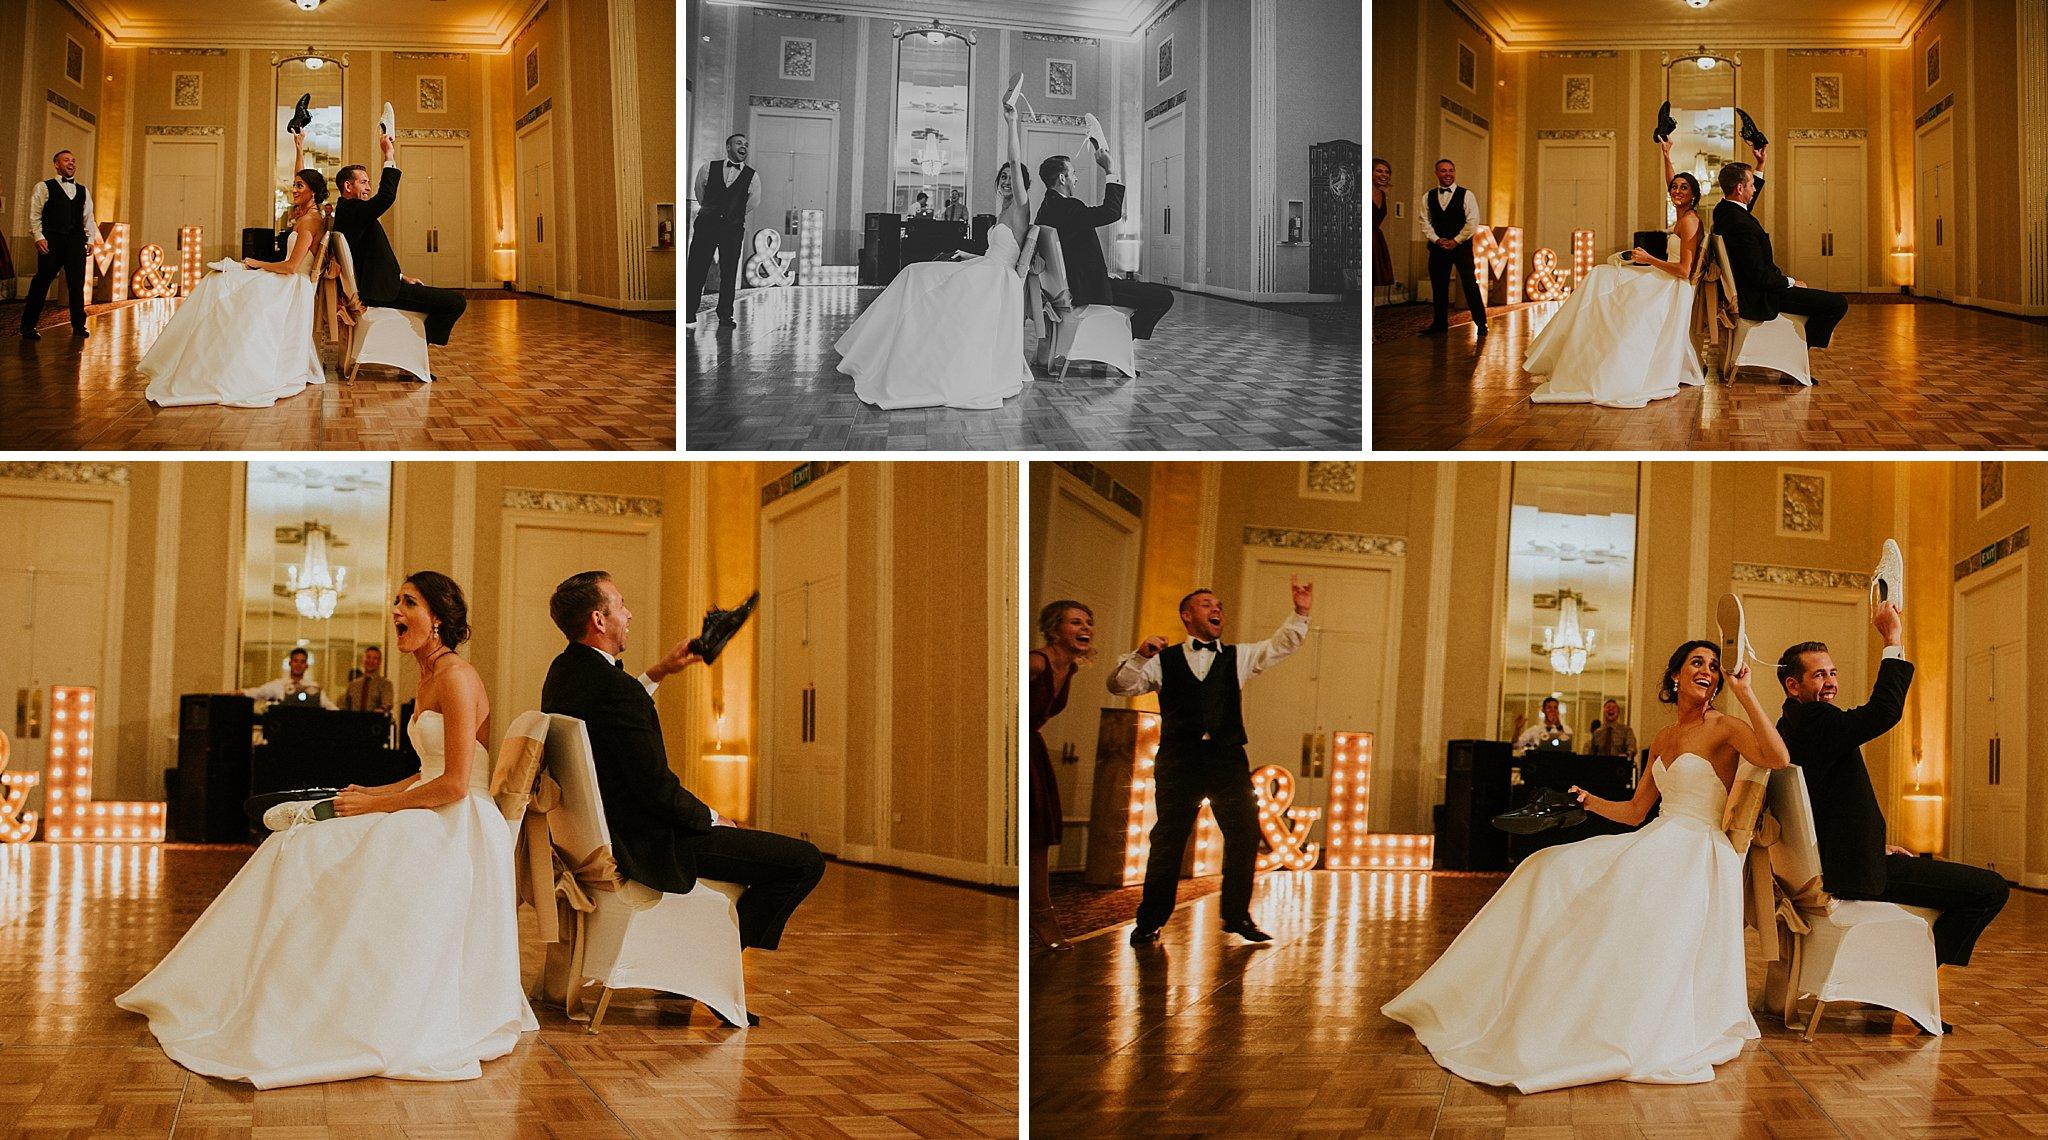 Matt-Lauren_St-Marys_Hilton-City-Center-Milwaukee-Wedding_liller-photo_0080.jpg